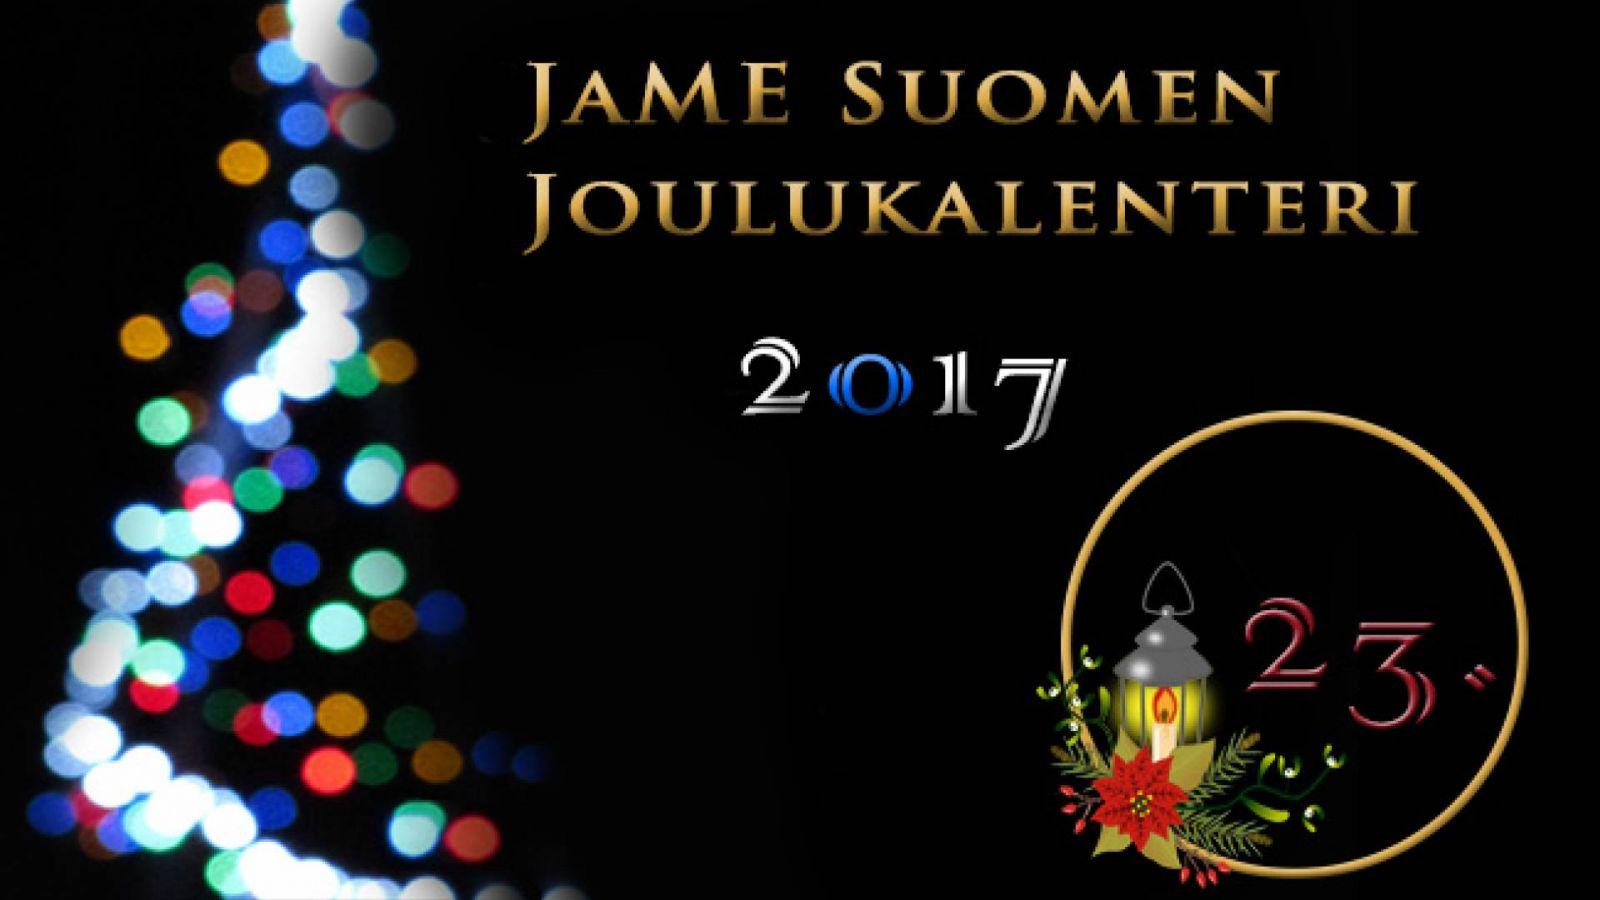 JaME Suomen joulukalenterin 23. luukku © Nipsu